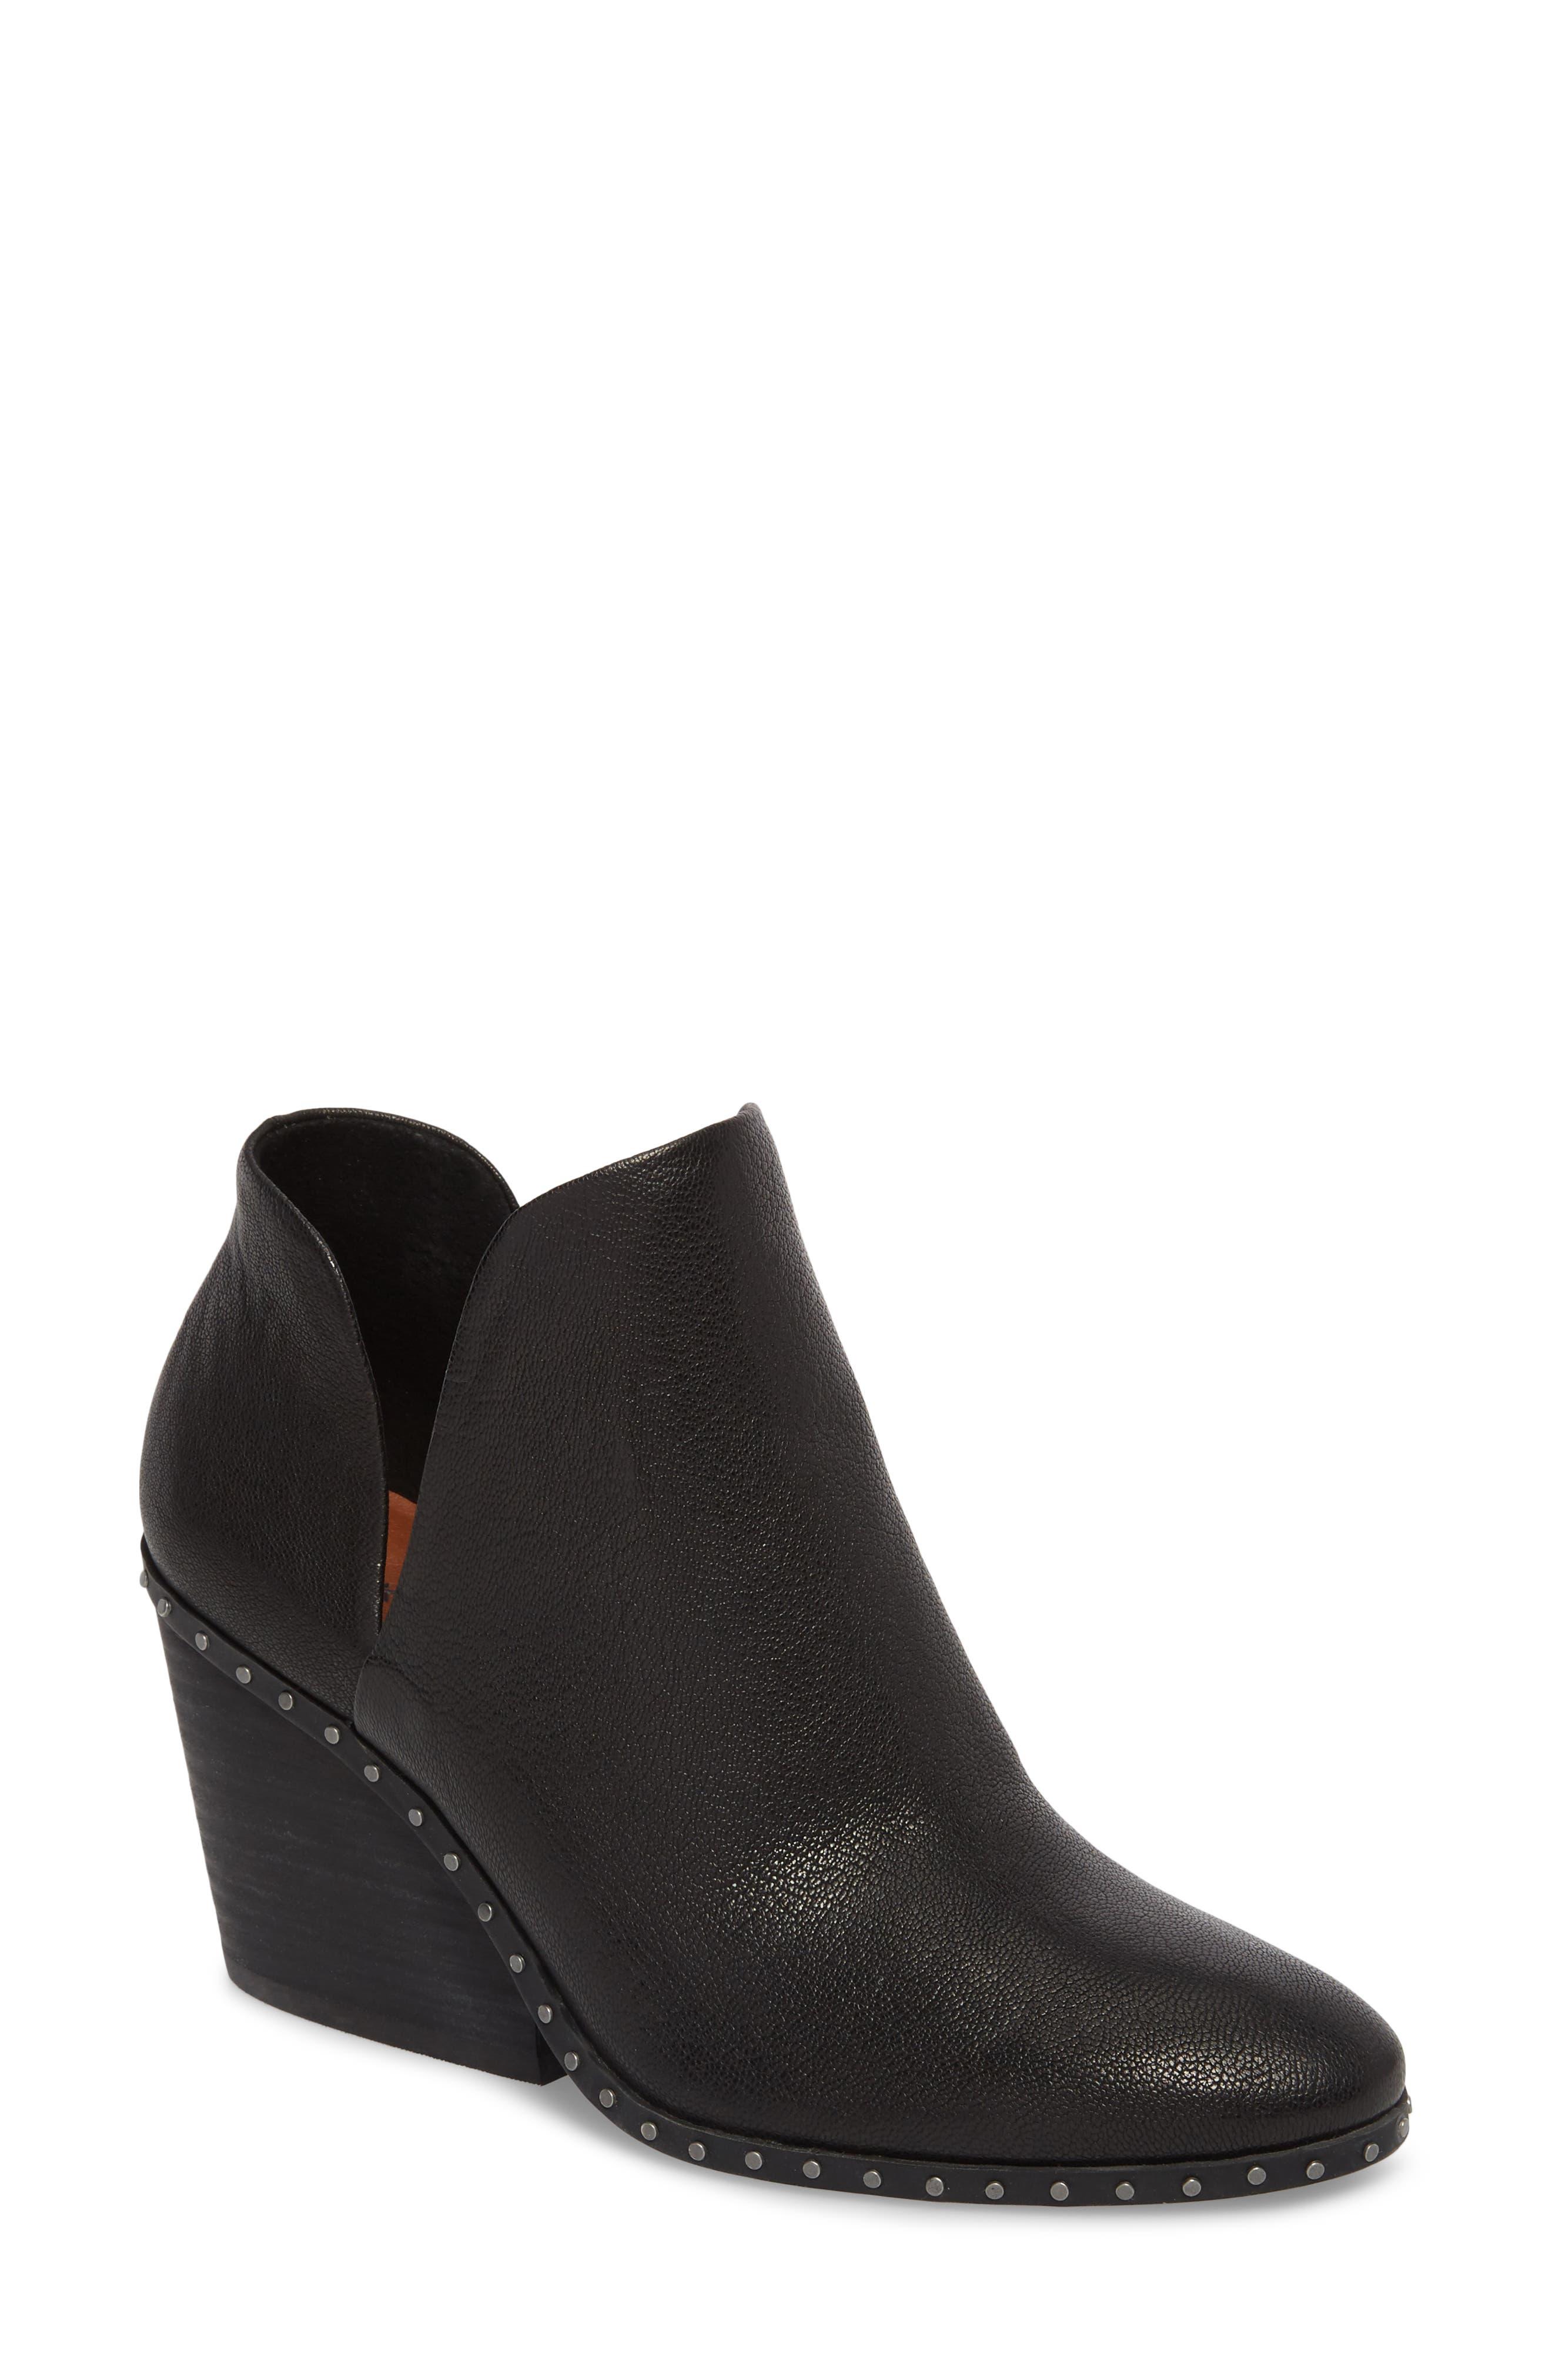 Lezzlee II Bootie,                         Main,                         color, Black Leather